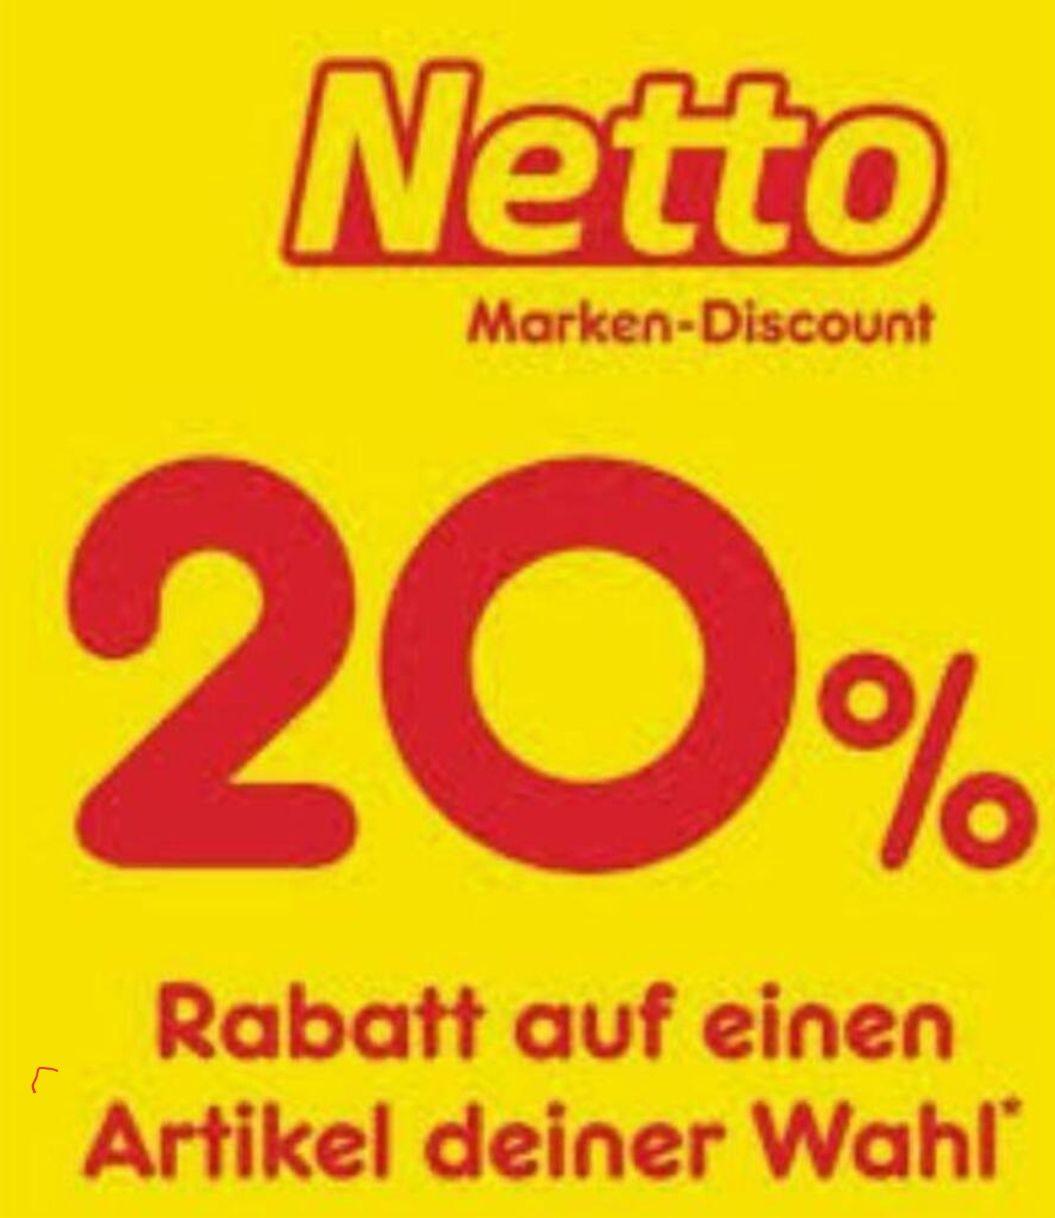 [Netto MD] Rabatt Coupons KW44 (26.10. - 31.10.), bundesweit einsetzbar